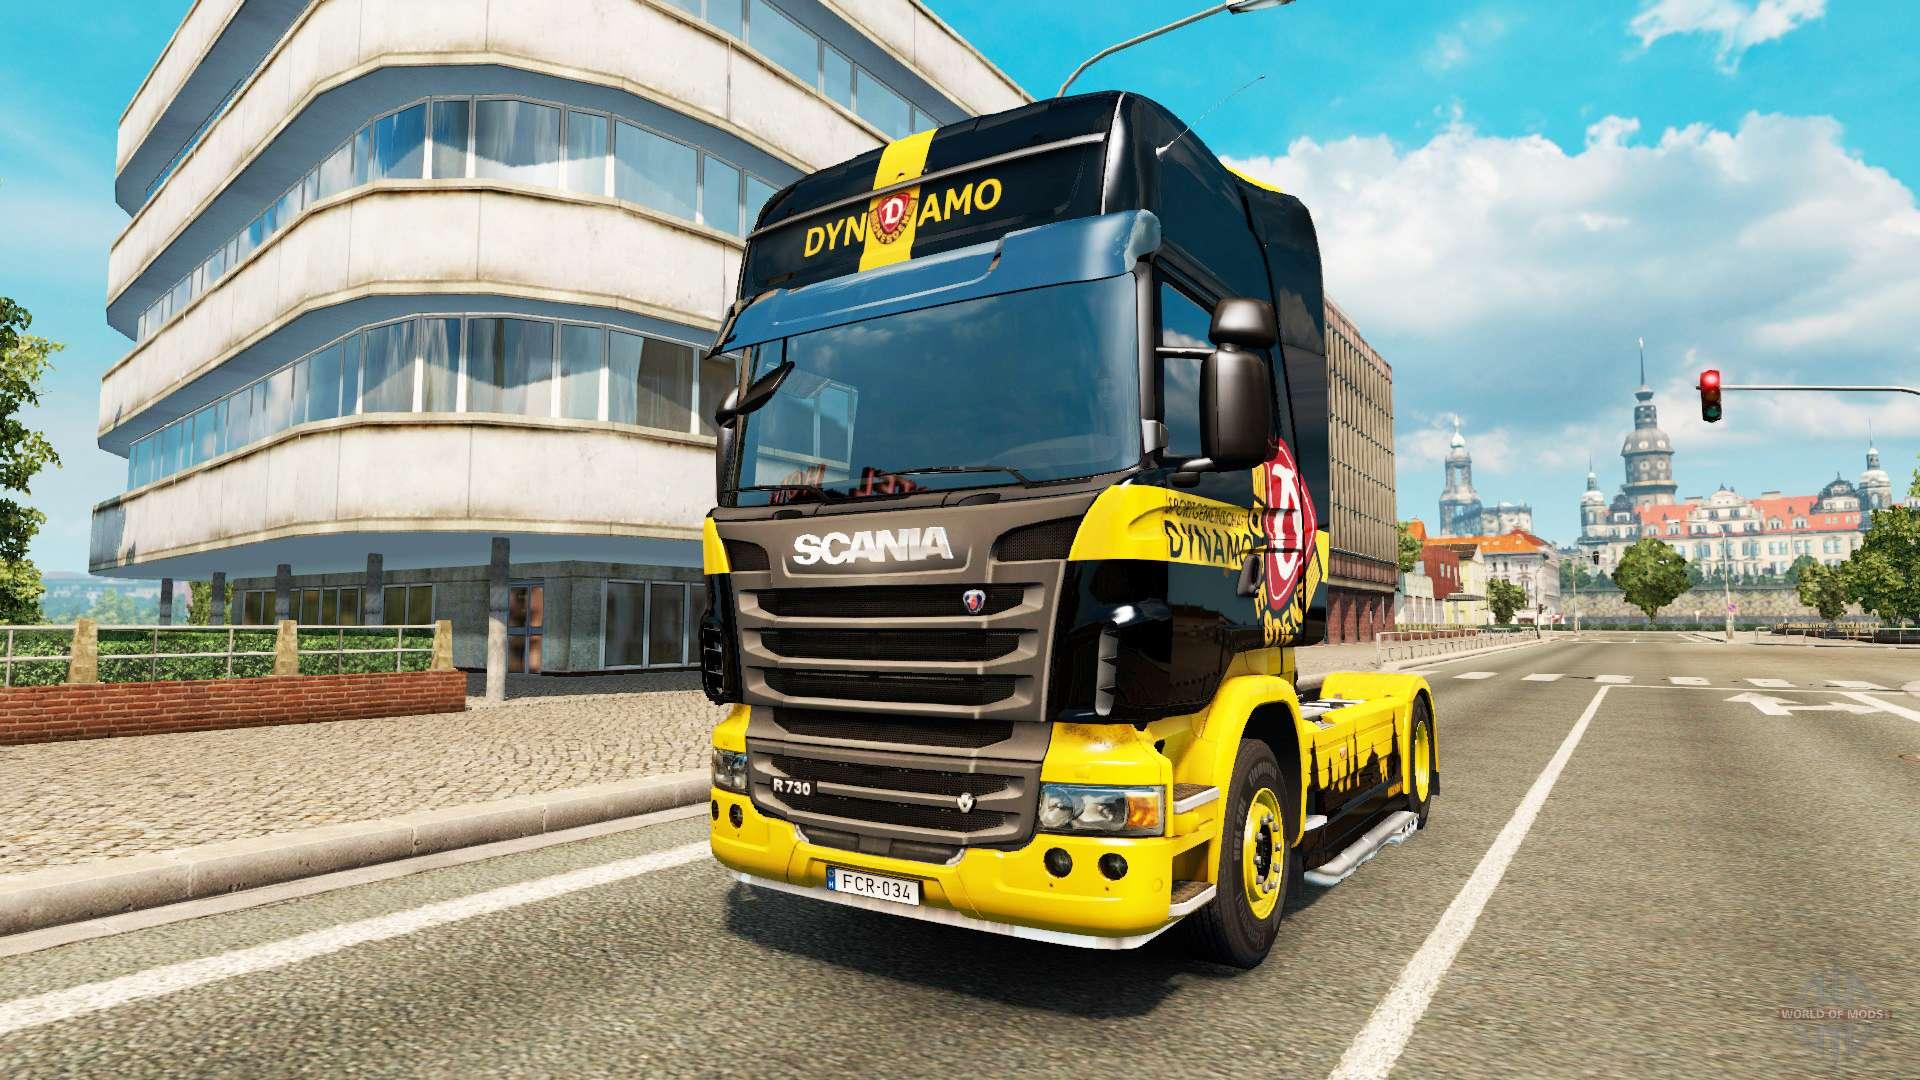 dynamo dresden skin f r scania lkw f r euro truck simulator 2. Black Bedroom Furniture Sets. Home Design Ideas